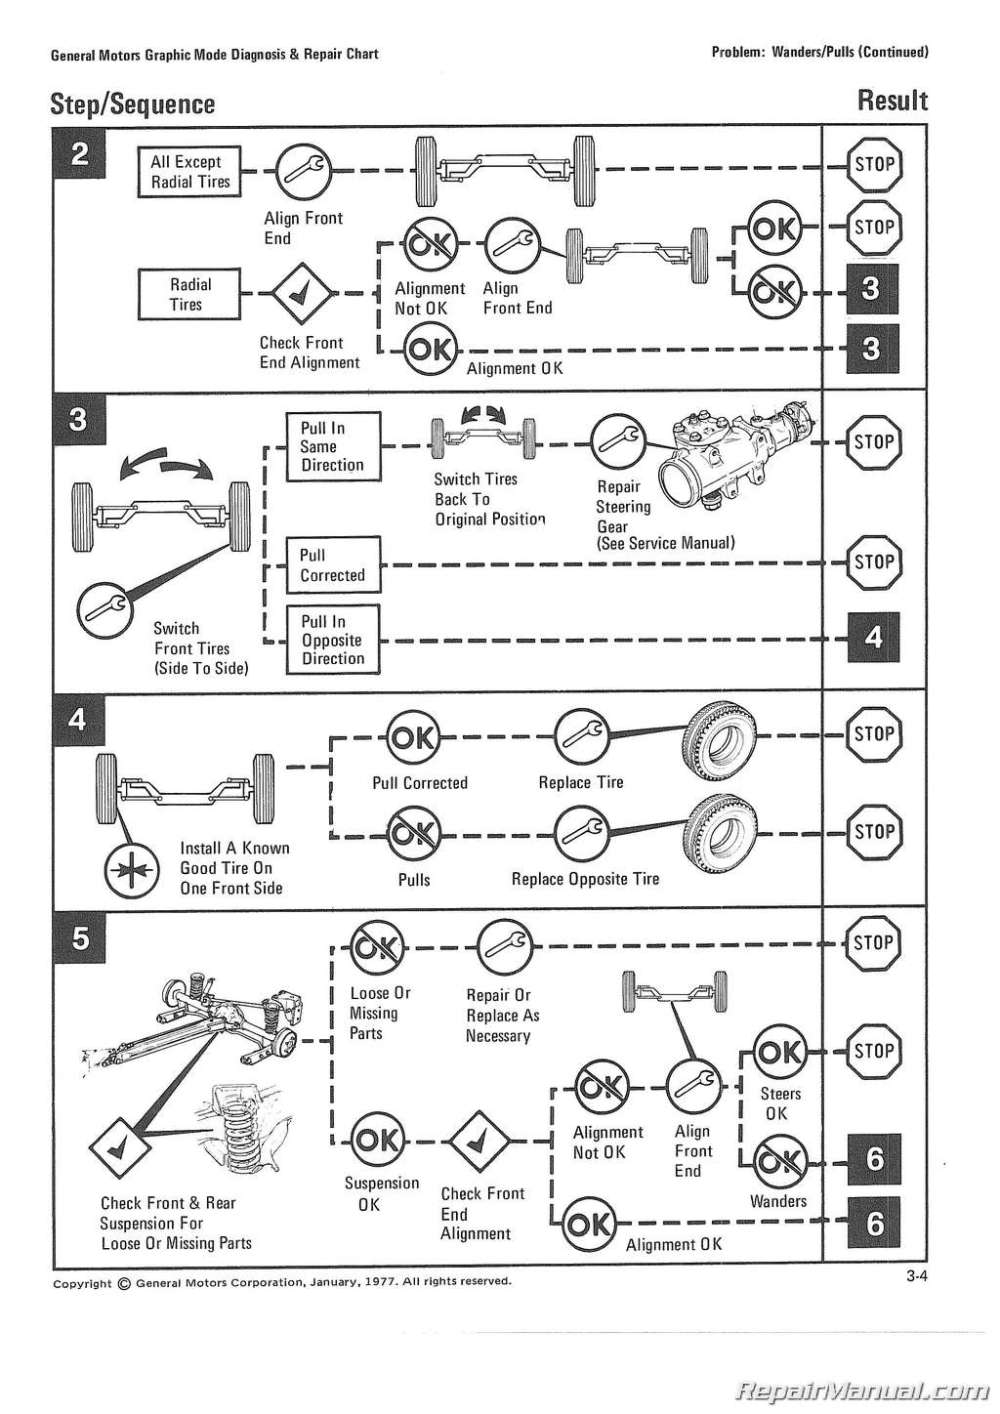 medium resolution of gm repair diagram